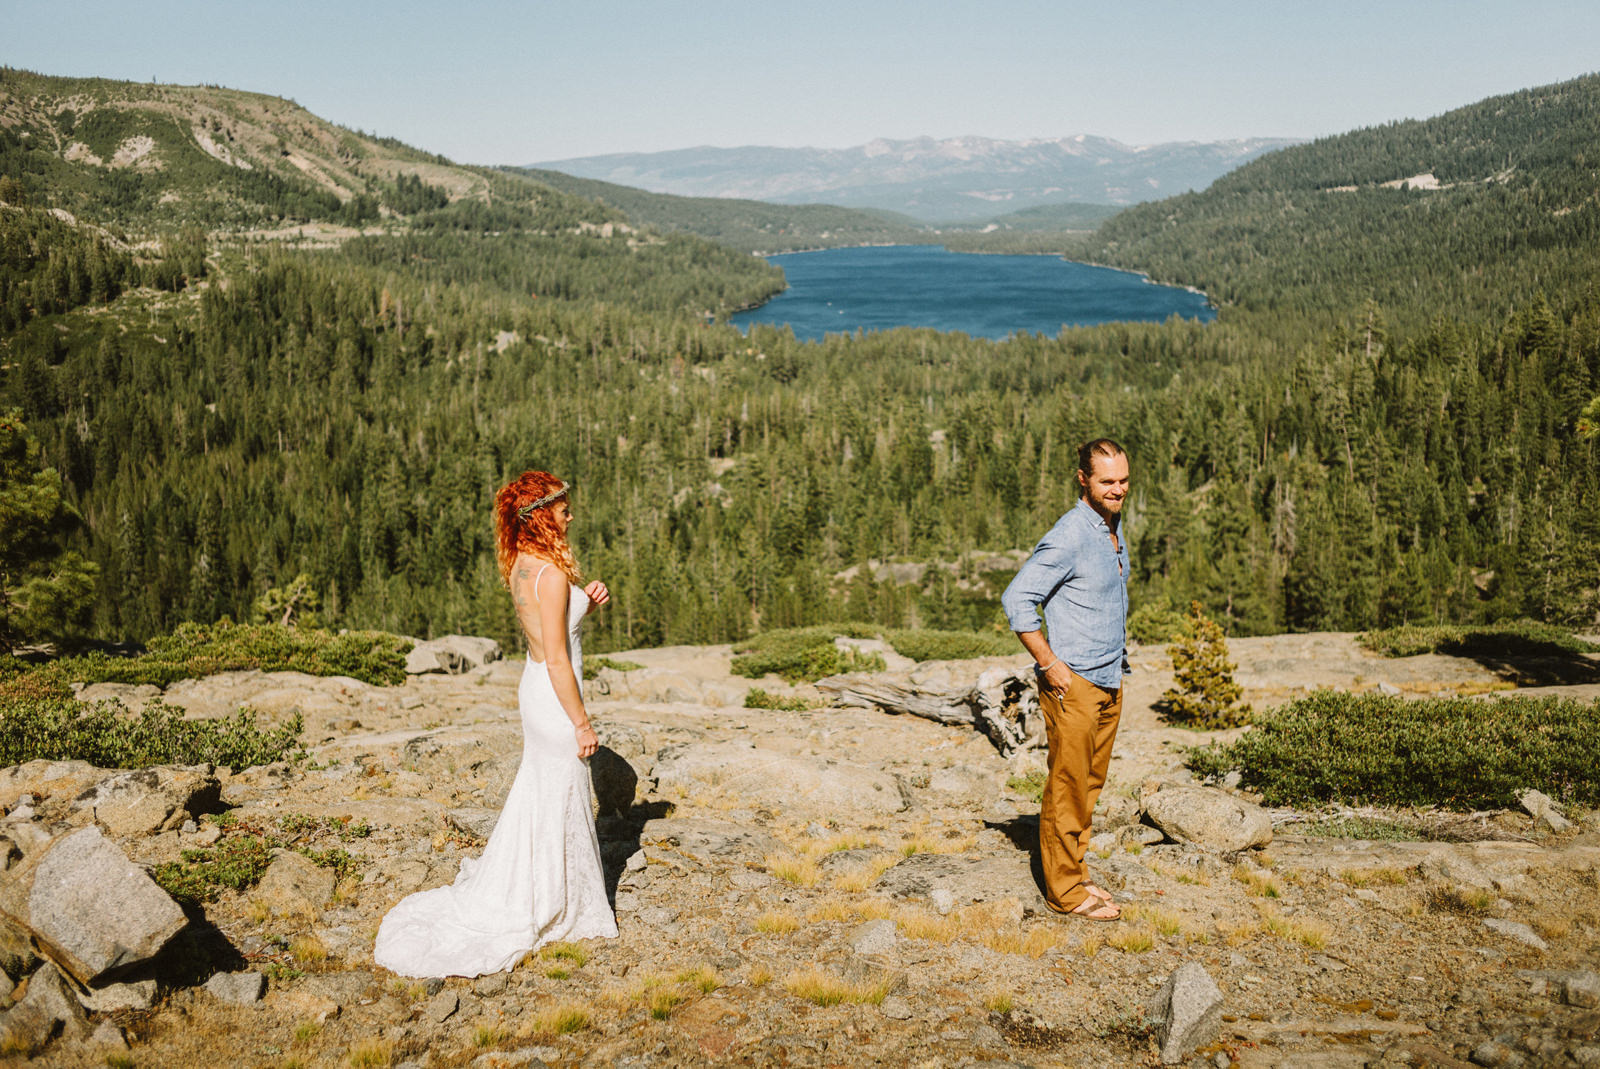 lake-tahoe-elopement-025 LAKE TAHOE ELOPEMENT